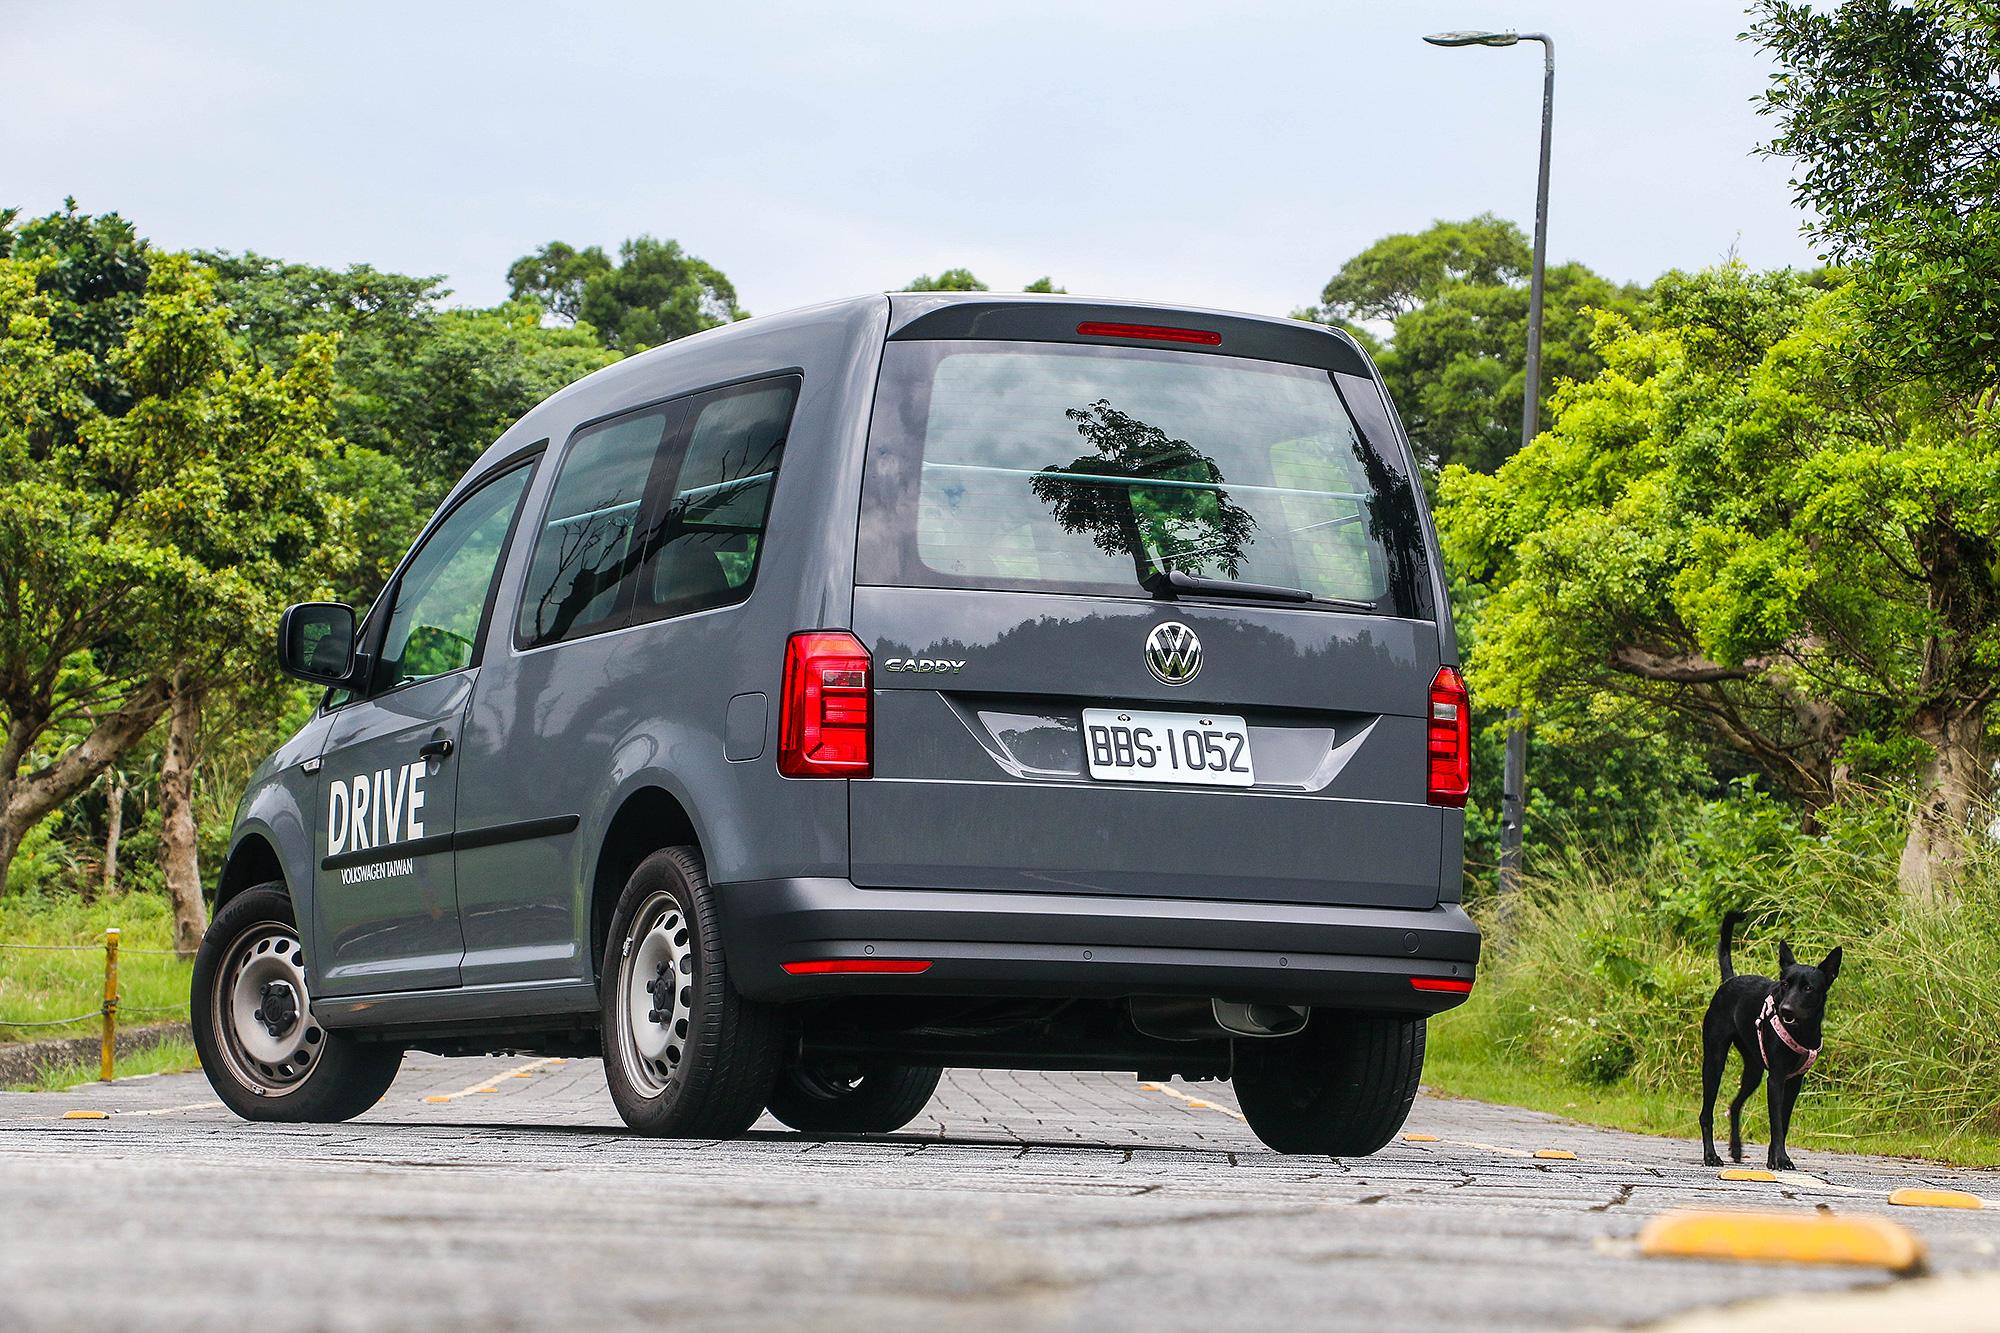 Caddy Van 1.4 TSI DSG 的魅力,讓路過的小黑也不禁駐足回首。